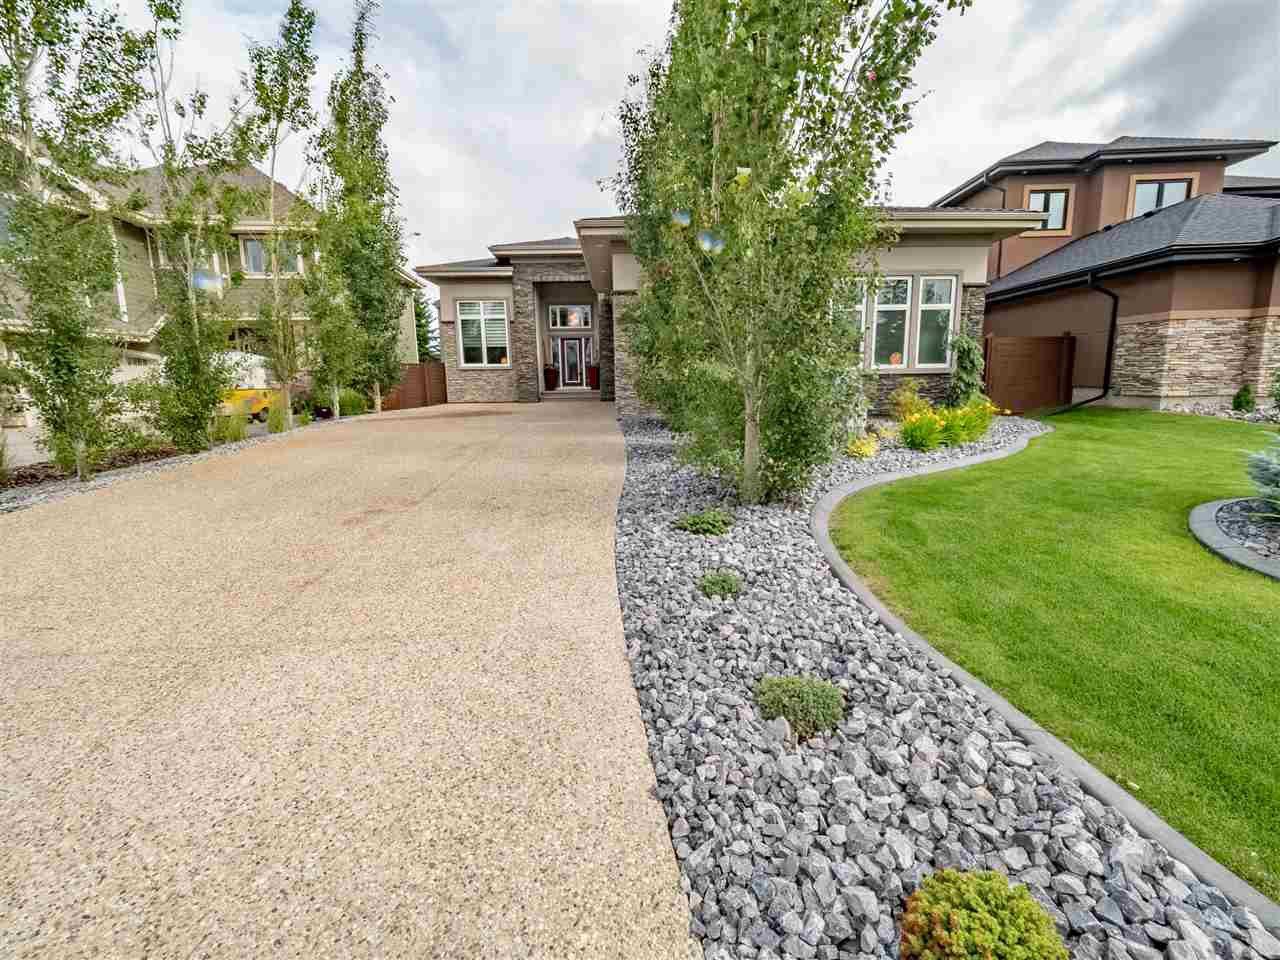 Photo 1: Photos: 58 Kenton Woods Lane NW: Spruce Grove House for sale : MLS®# E4166439